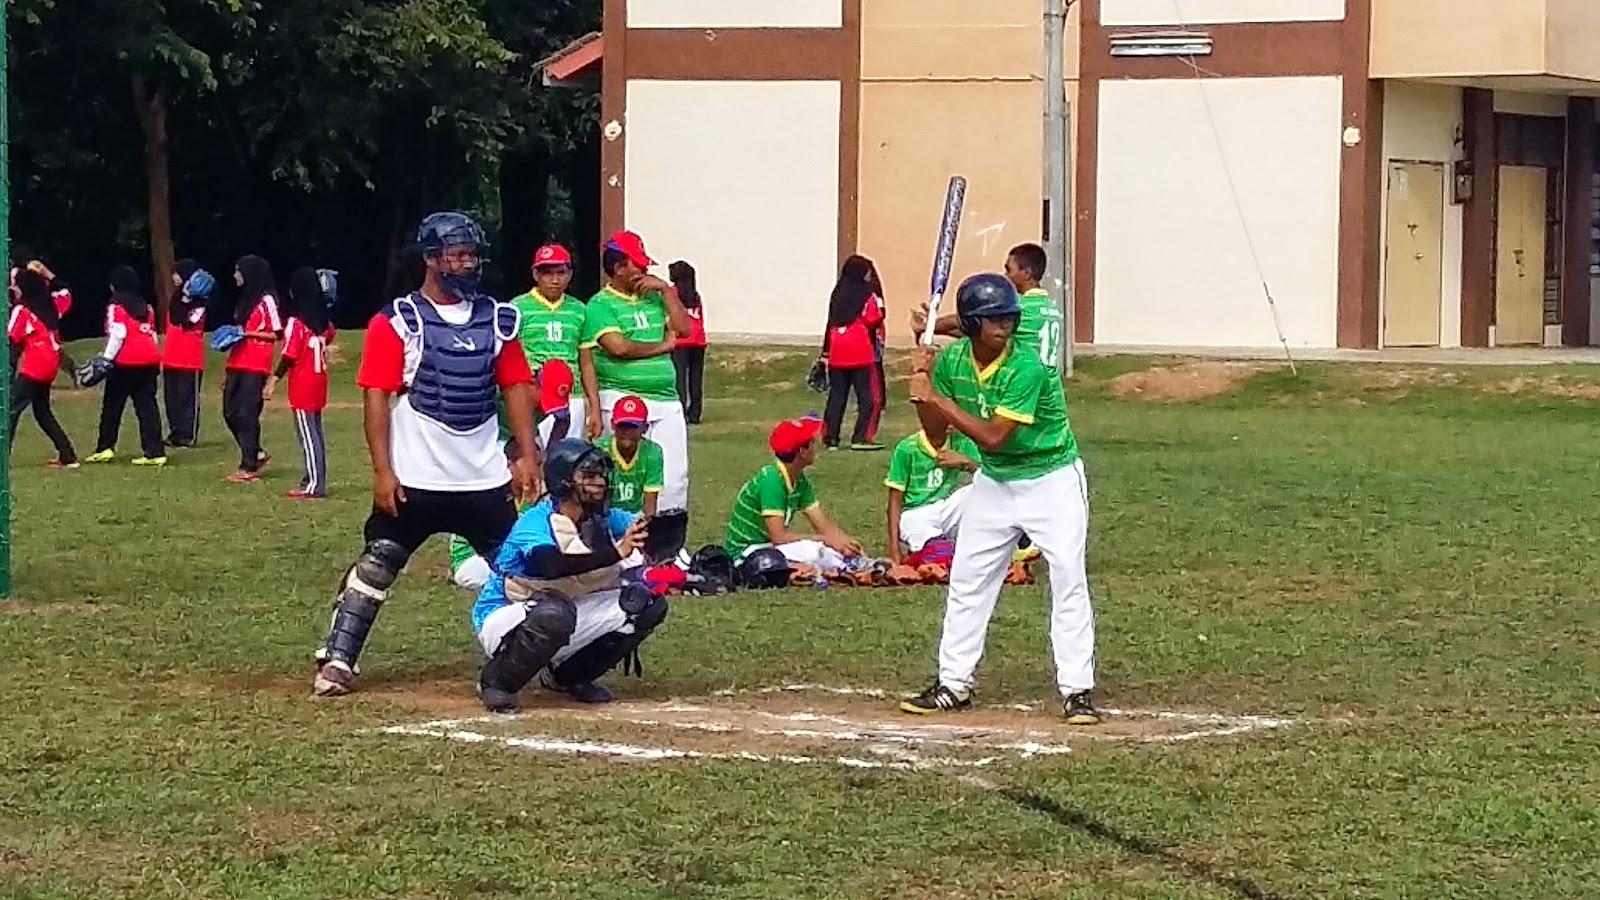 Kejohanan Sofbol MSSD Kubang Pasu 2015 - SMK Jerlun vs SMK Hosba